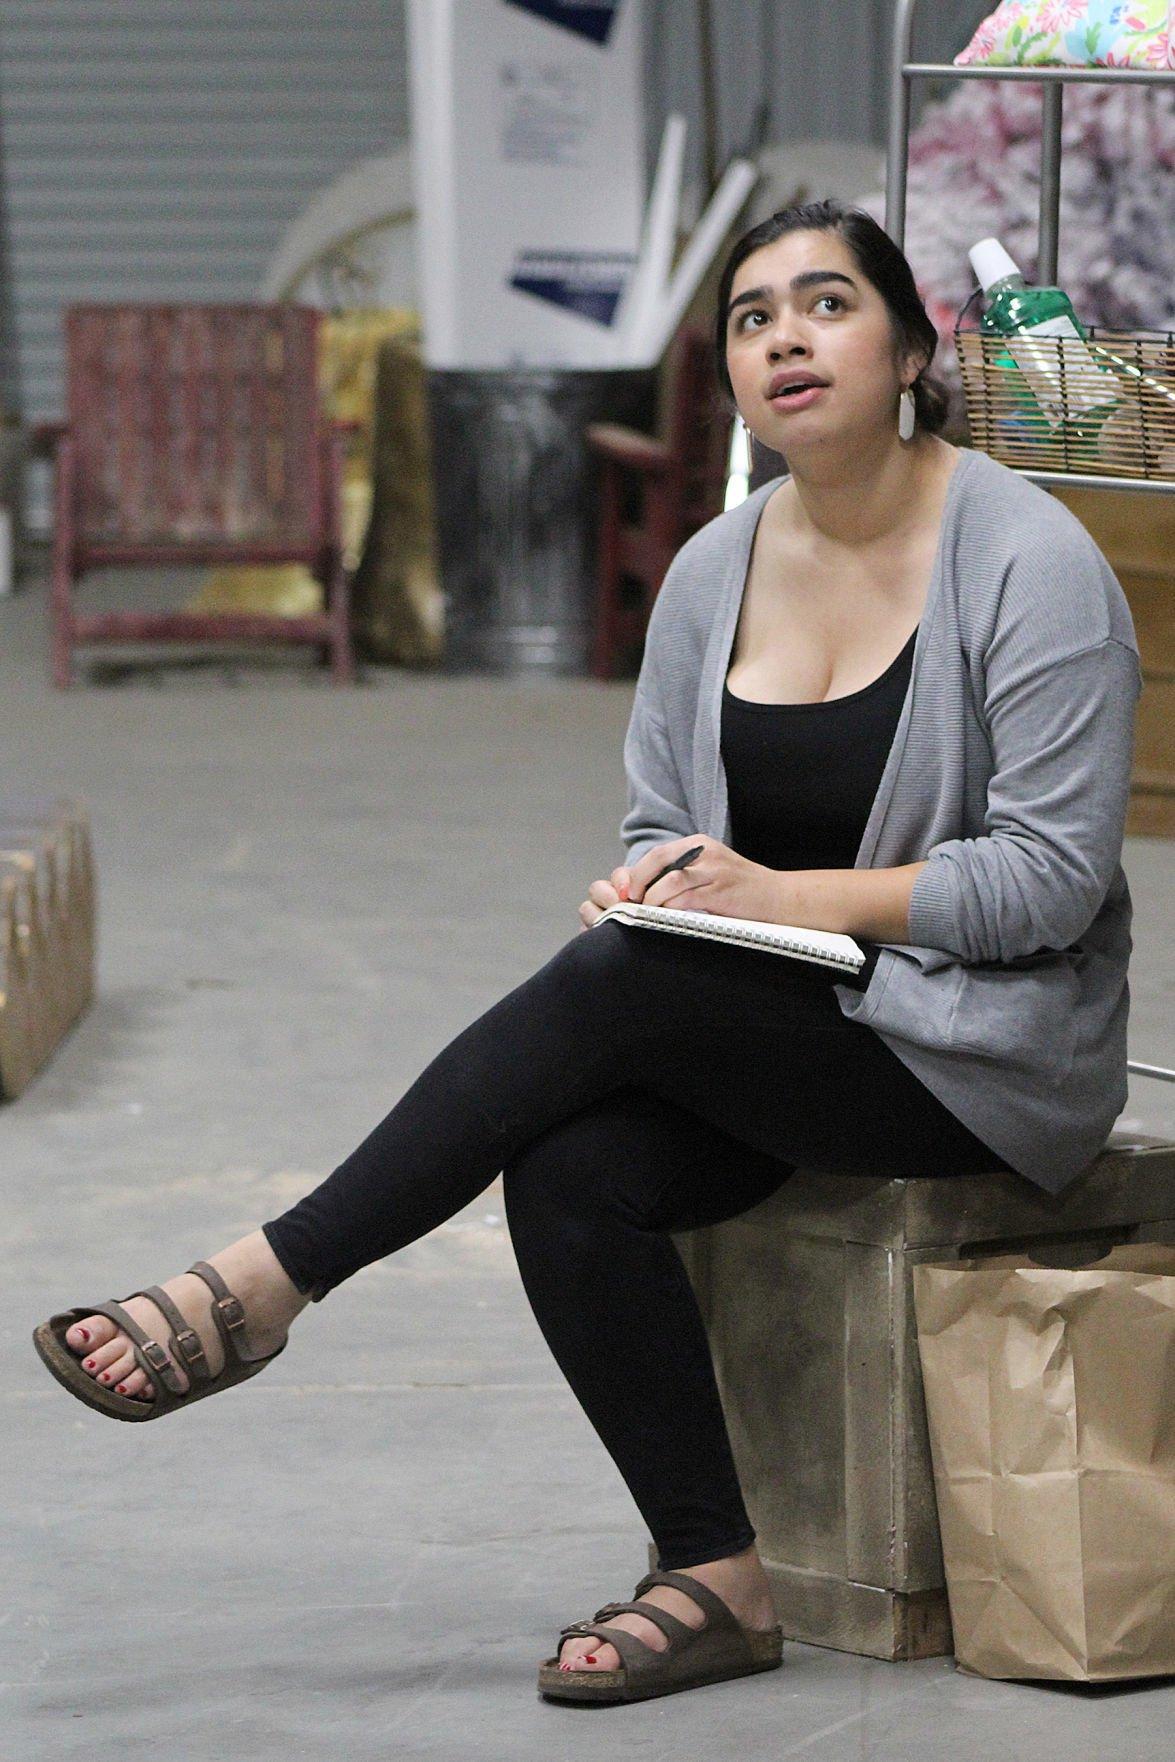 'Real Women': Julia Prieto